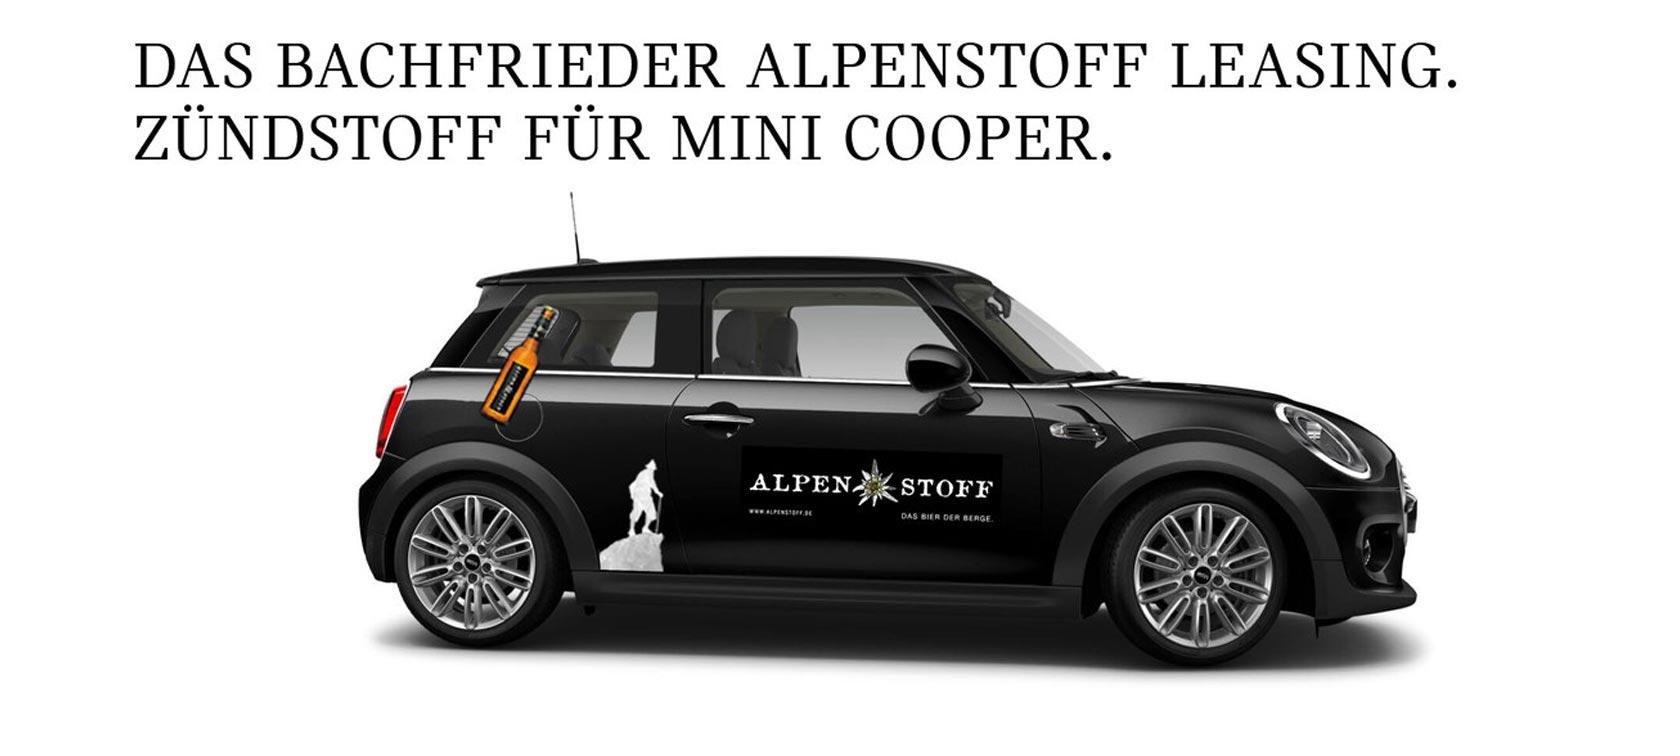 MINI Alpenstoff, one, cabrio, clubman, jcw, cooper, angebot, pkw, audi, mercedes, vw